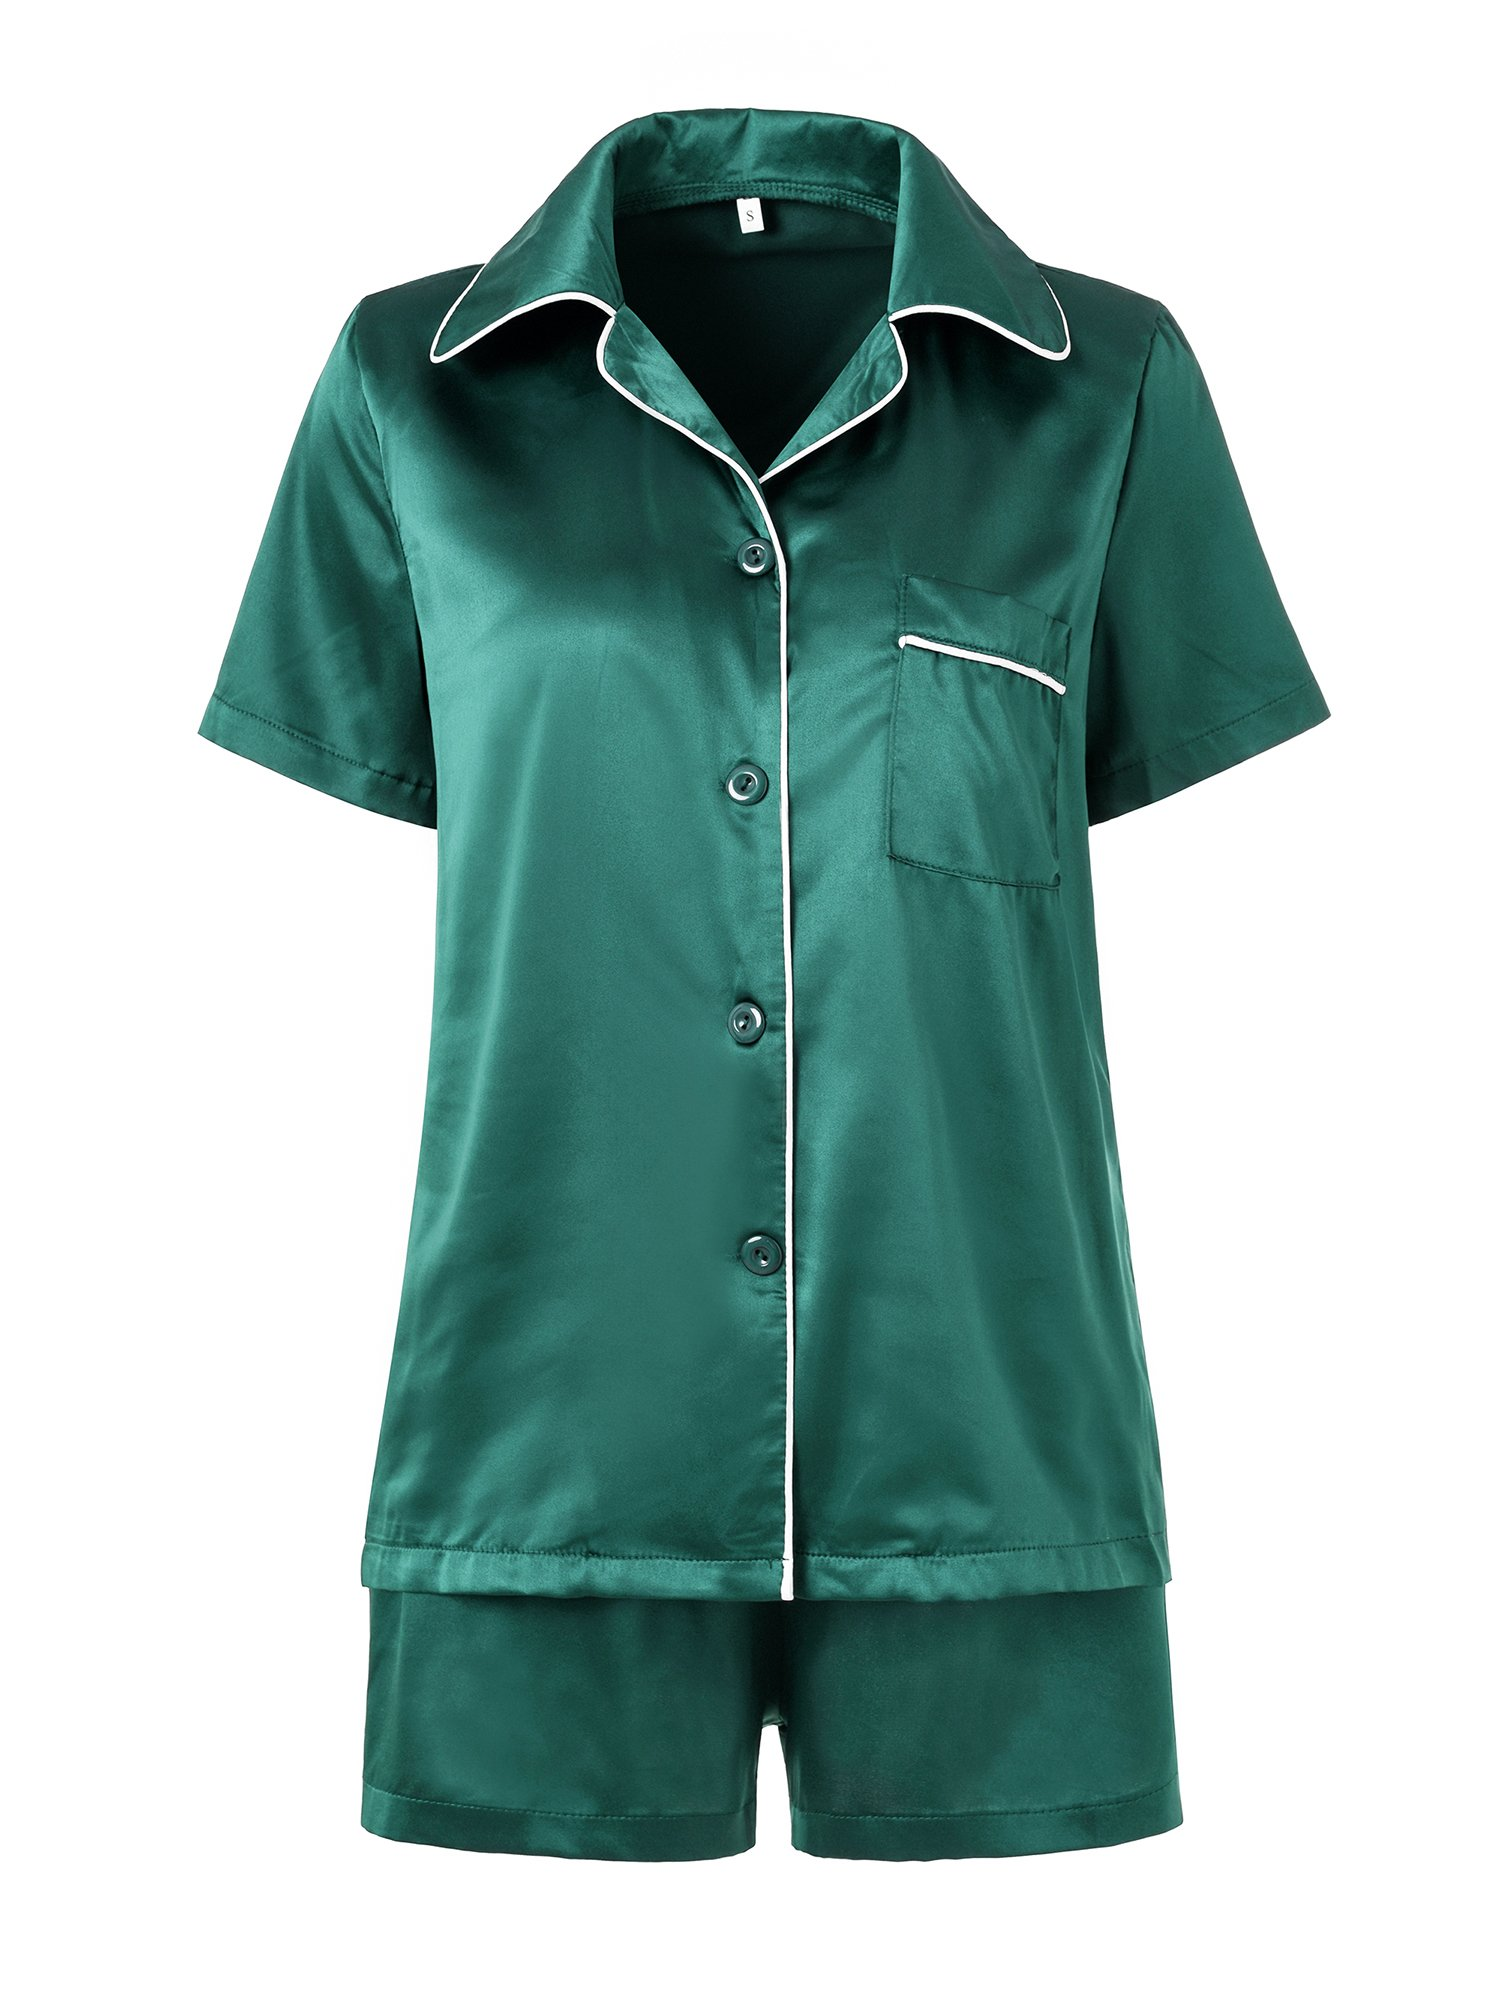 Summer pj,Ladies Pajama Soft Cool Sleep Set Satin Nightwear Travel